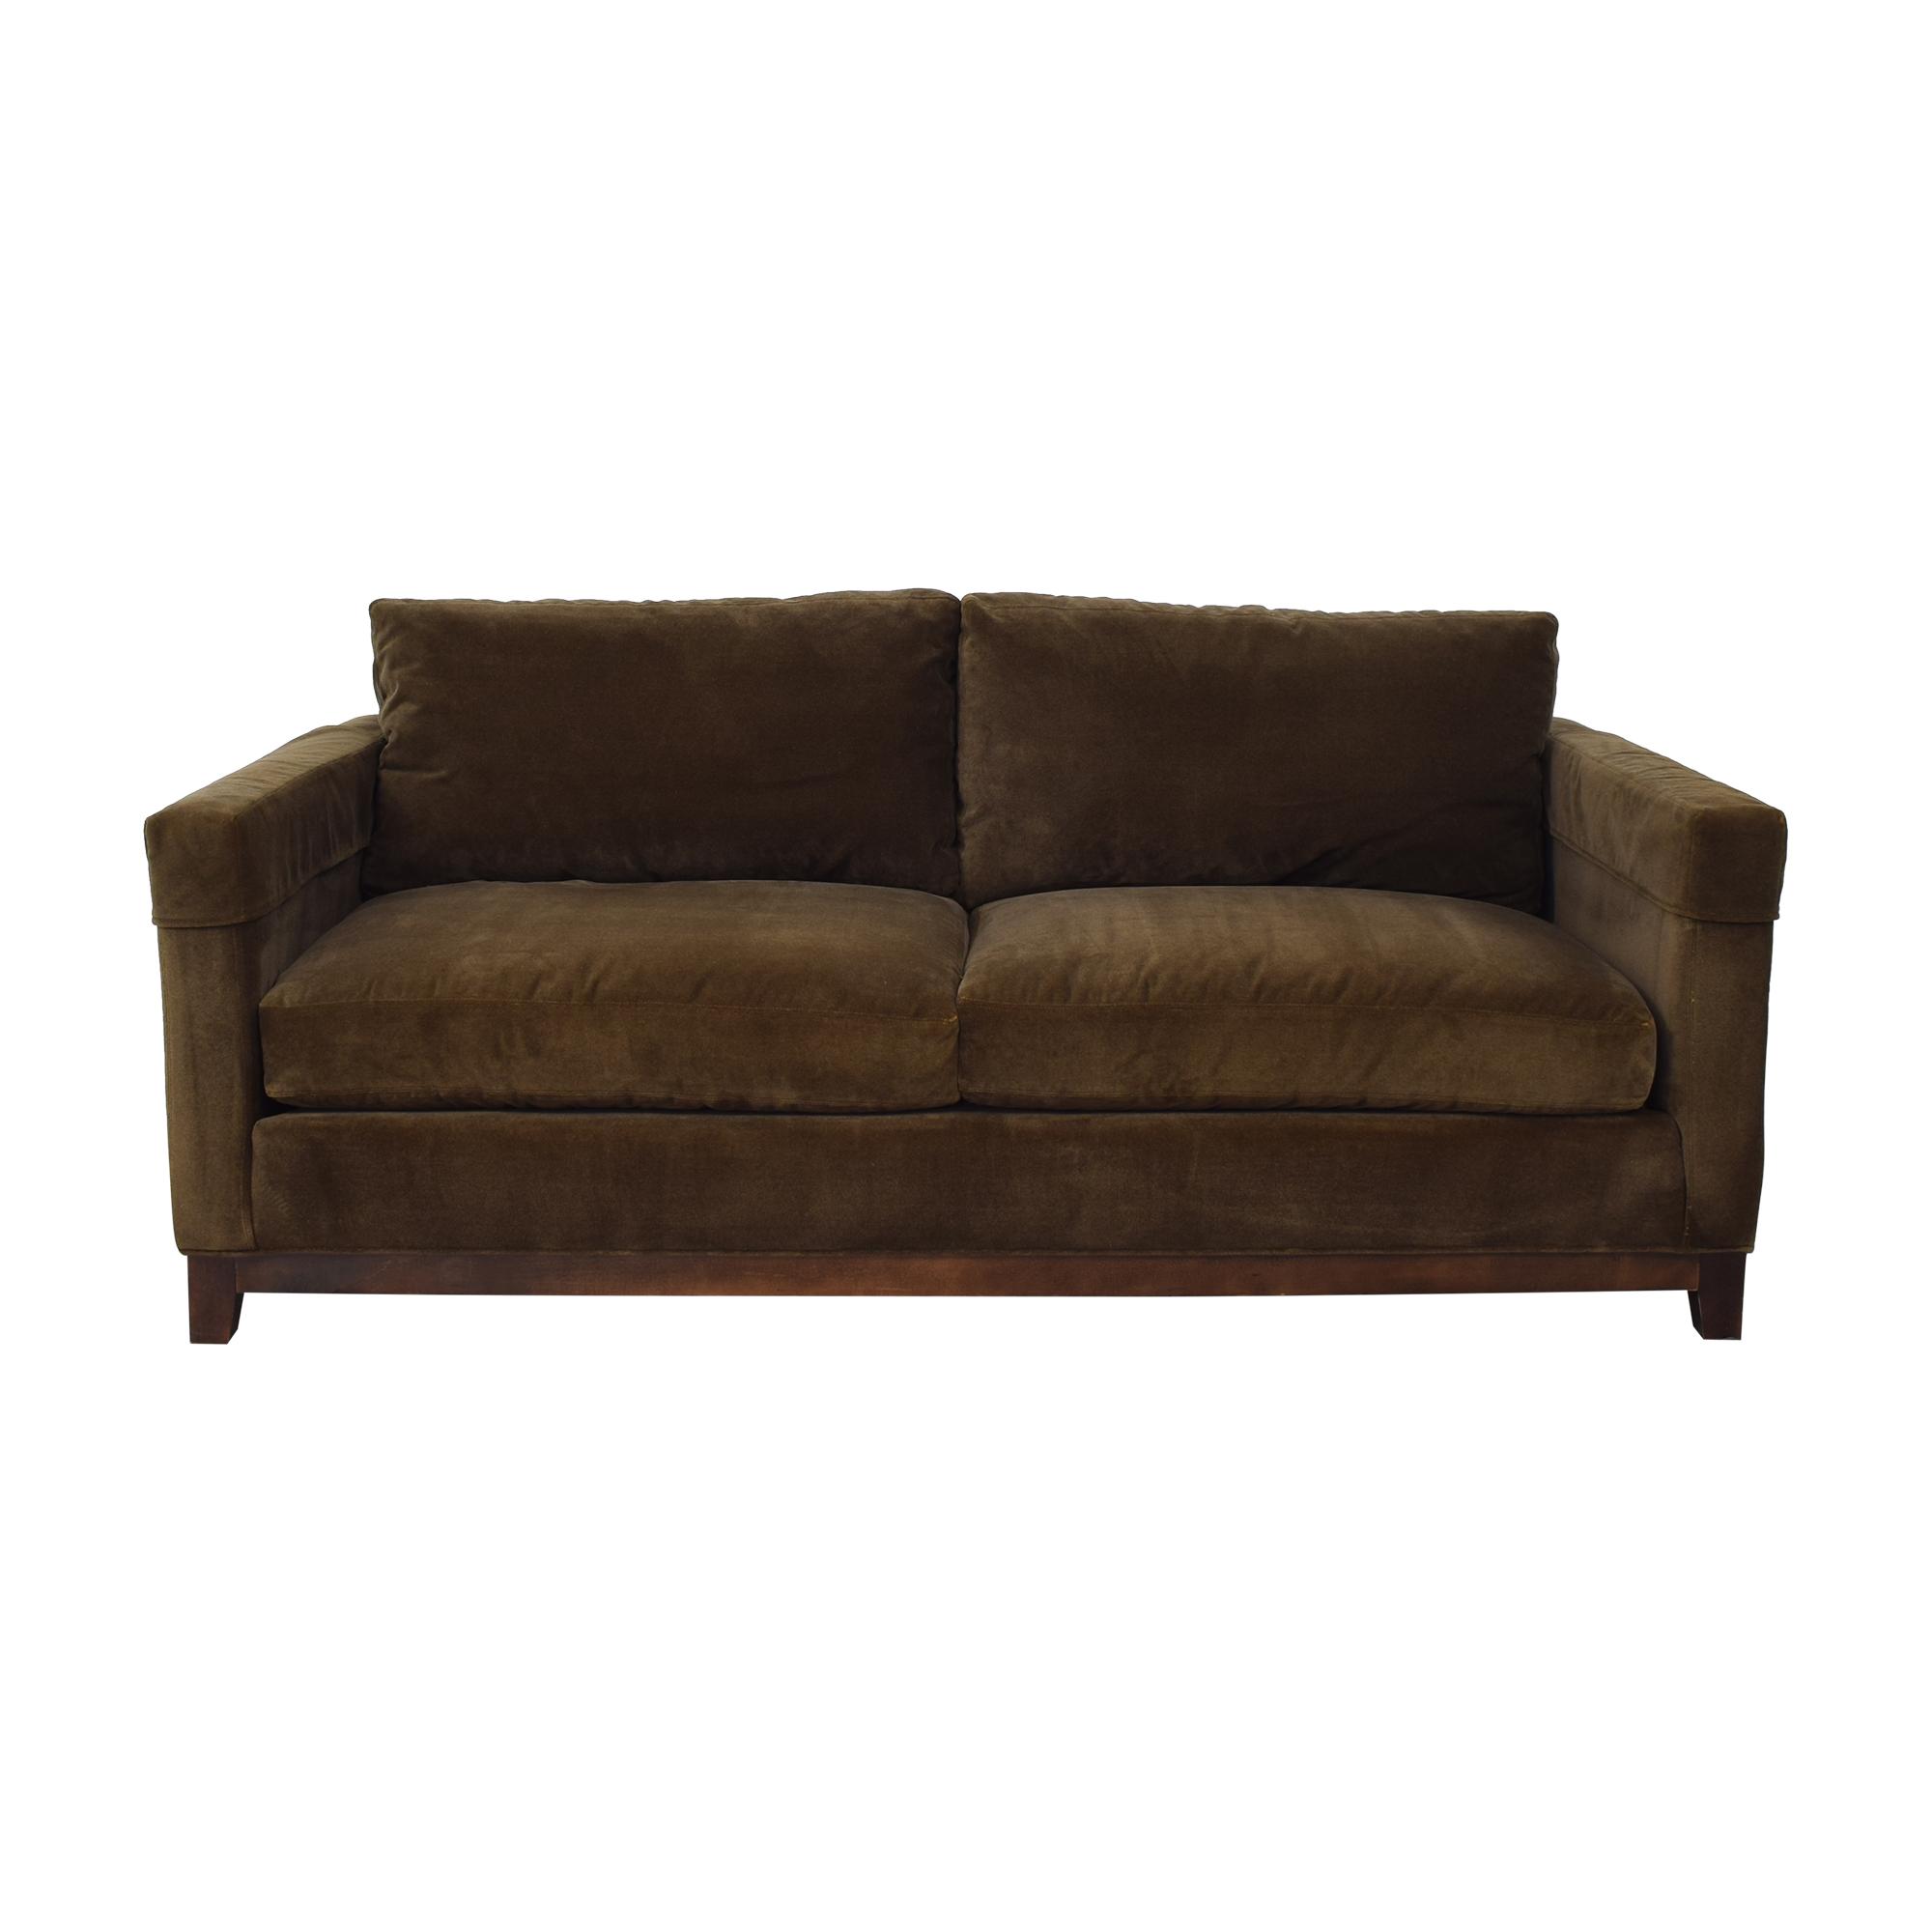 American Home Furniture American Home Furniture Two Cushion Sofa on sale